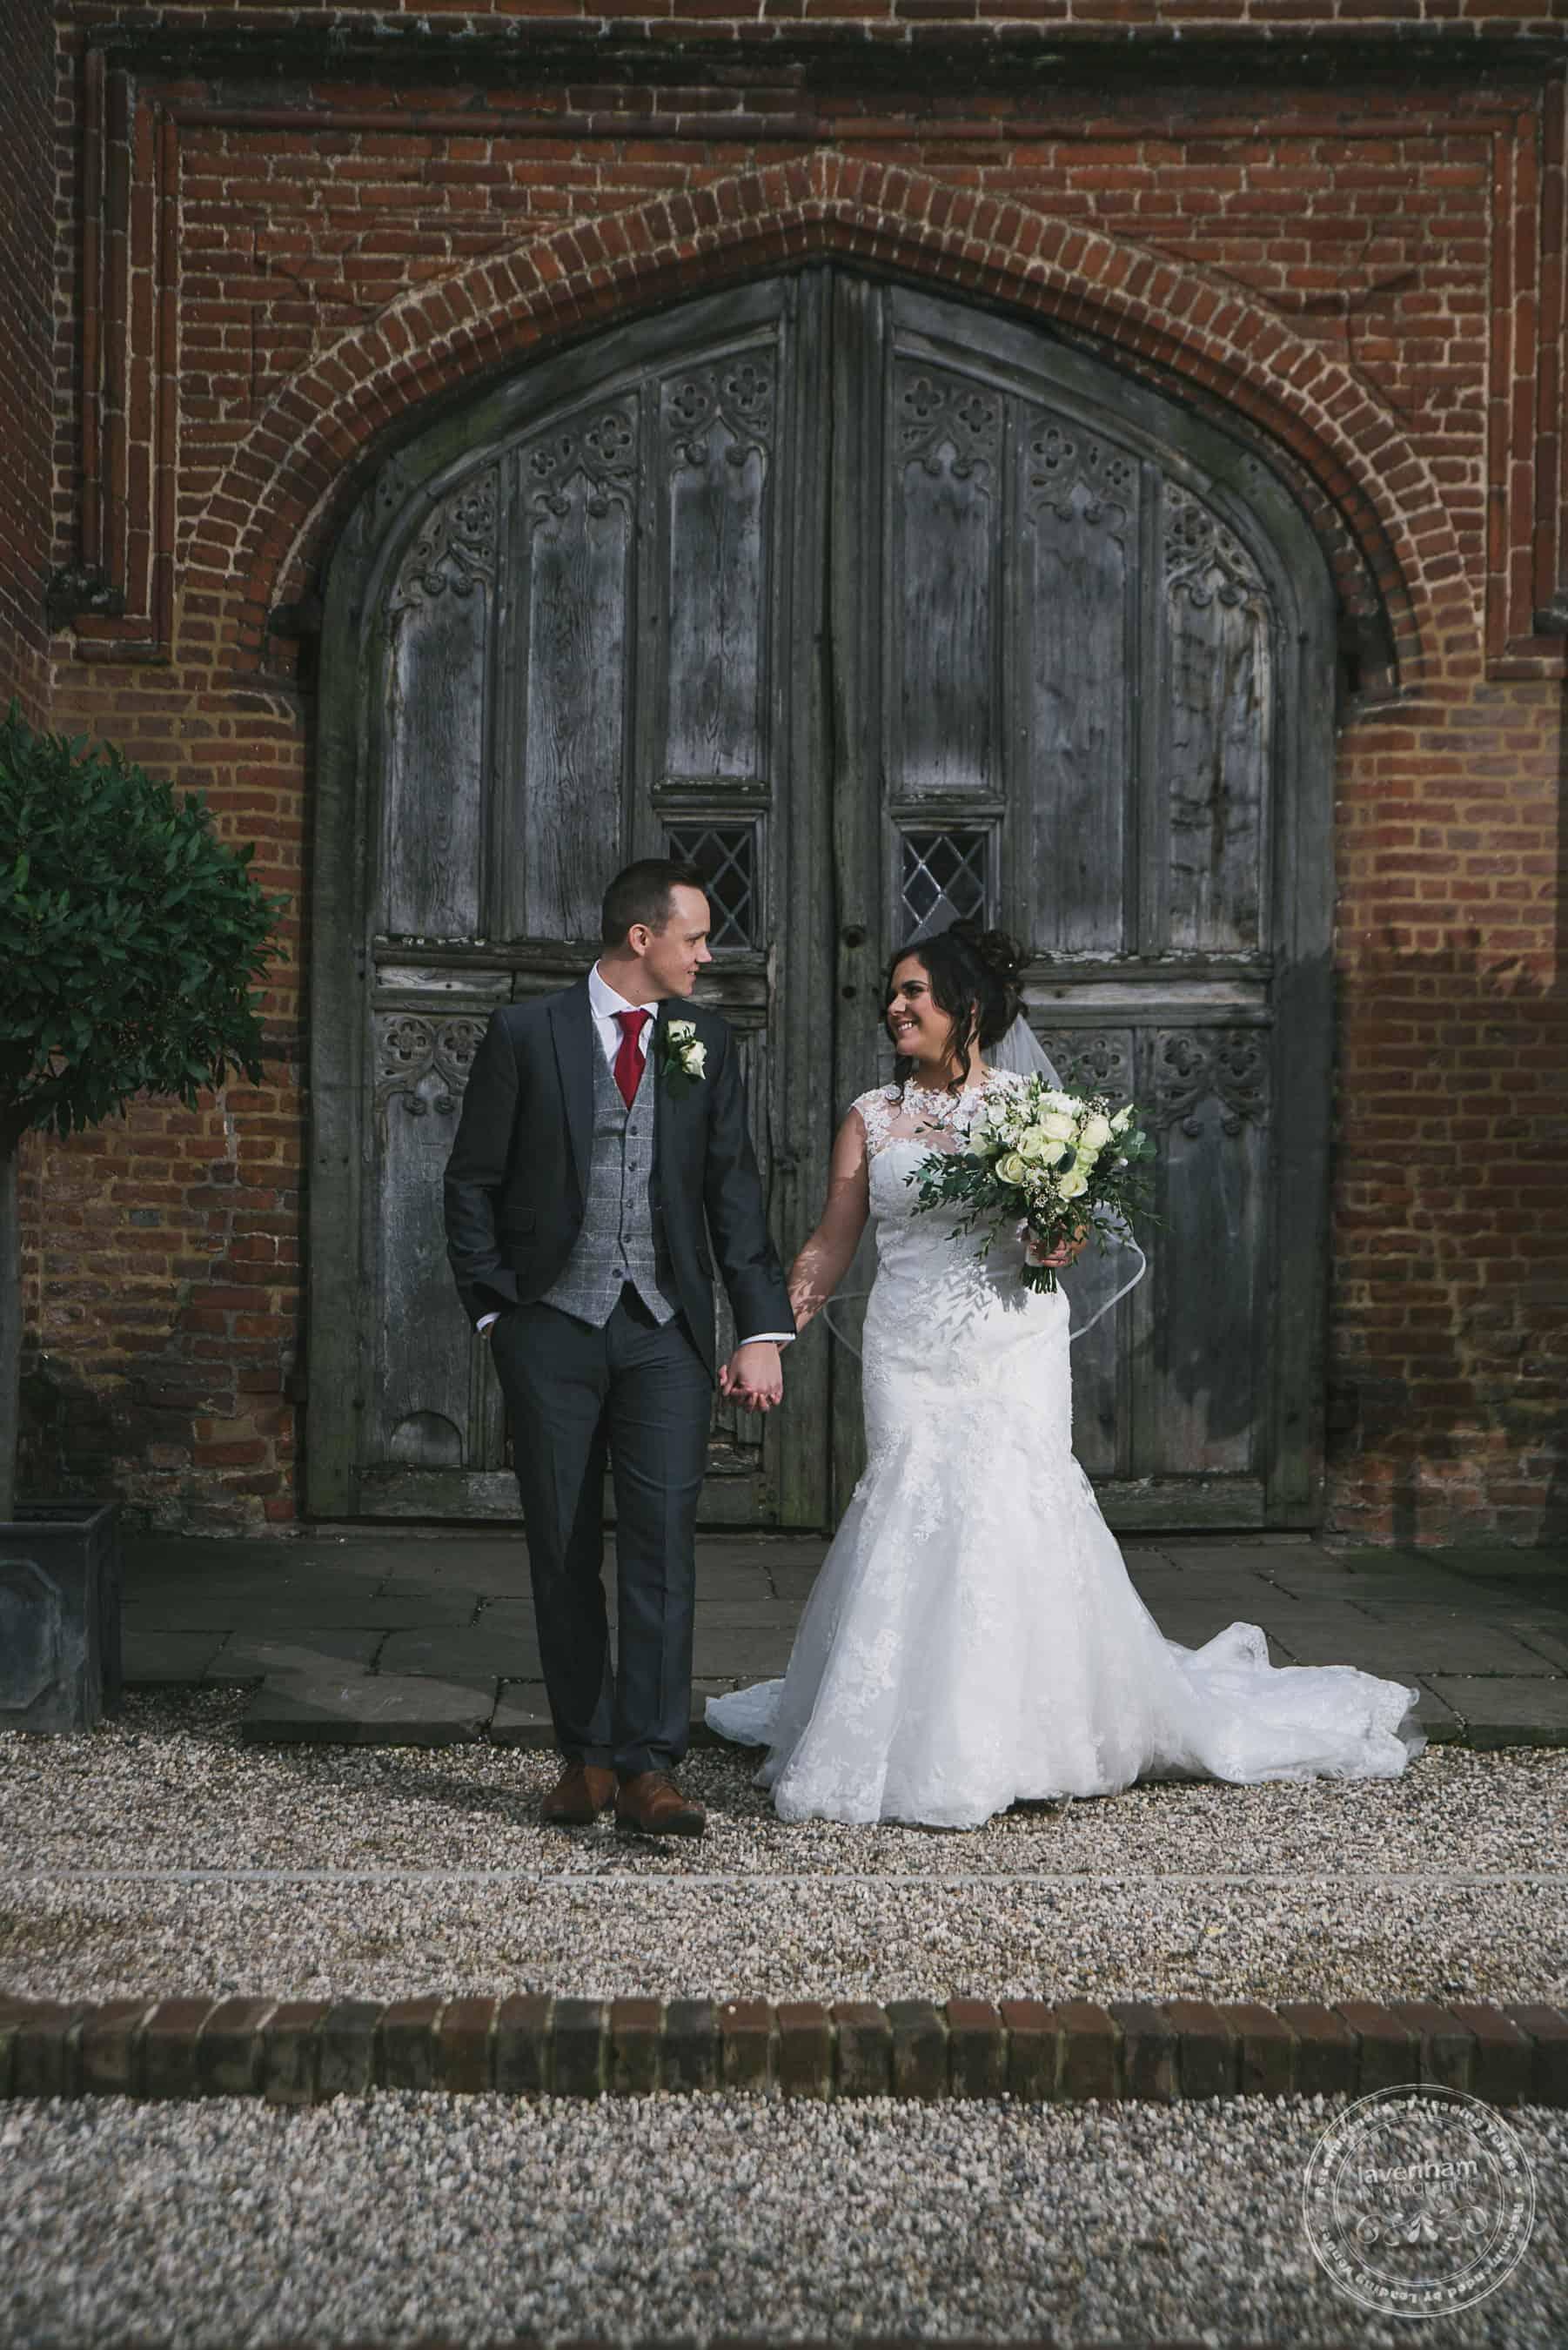 251118 Leez Priory Wedding Photography by Lavenham Photographic 077